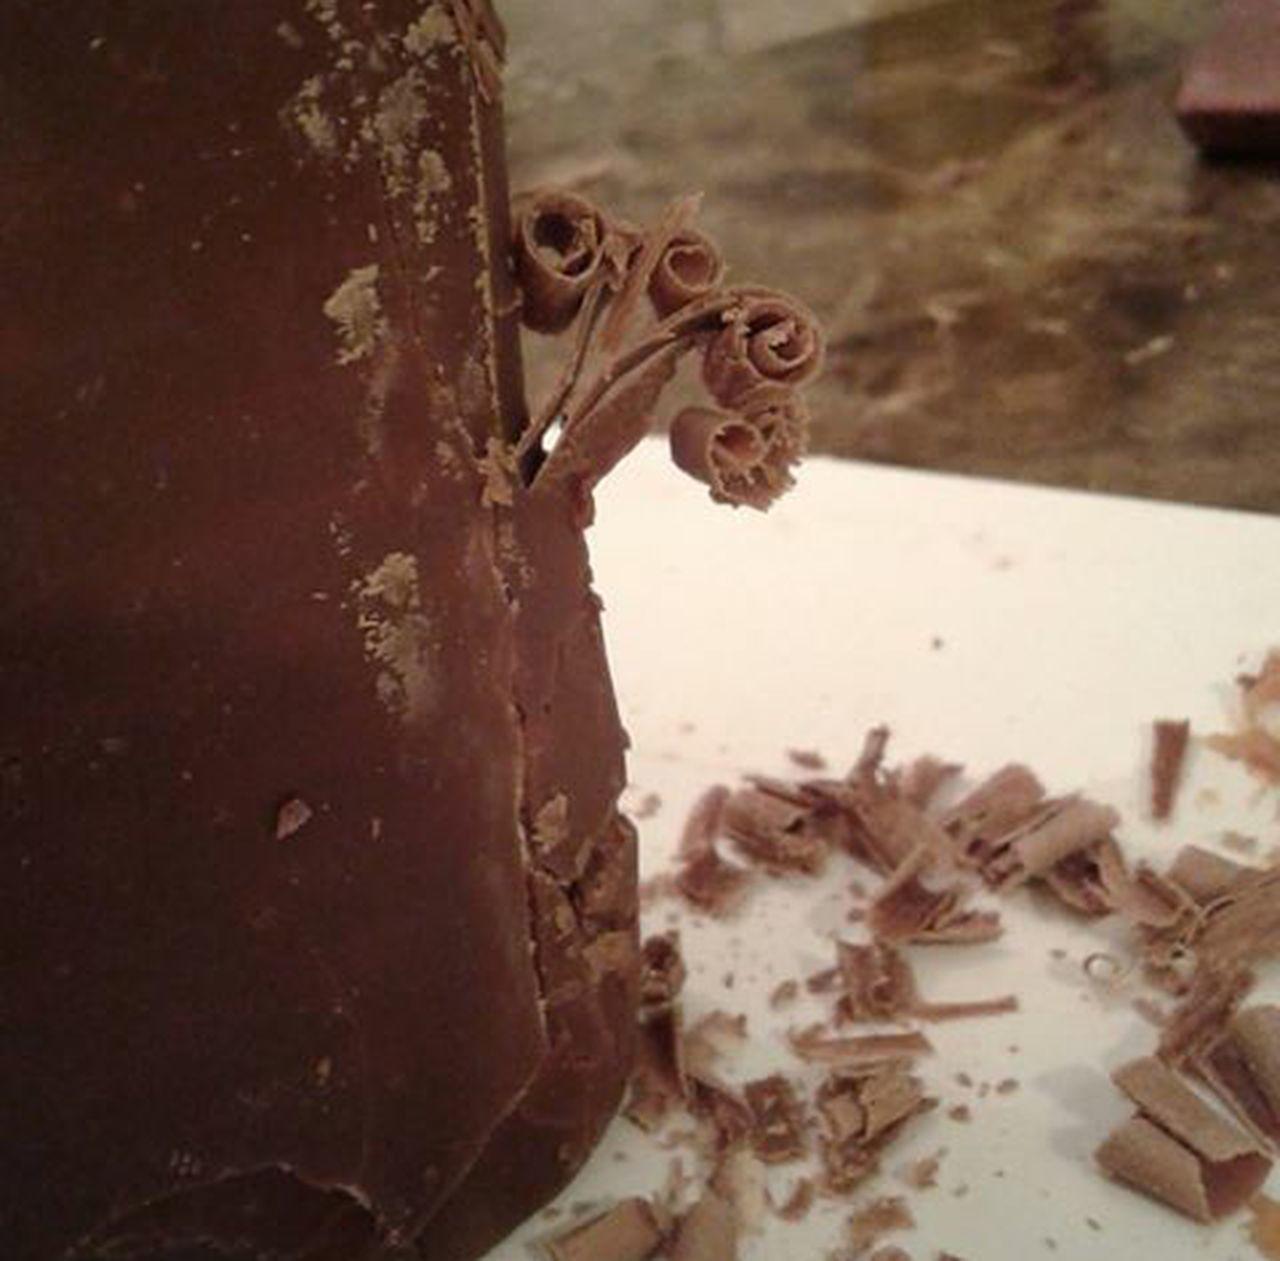 Uuummm..... Chocolate